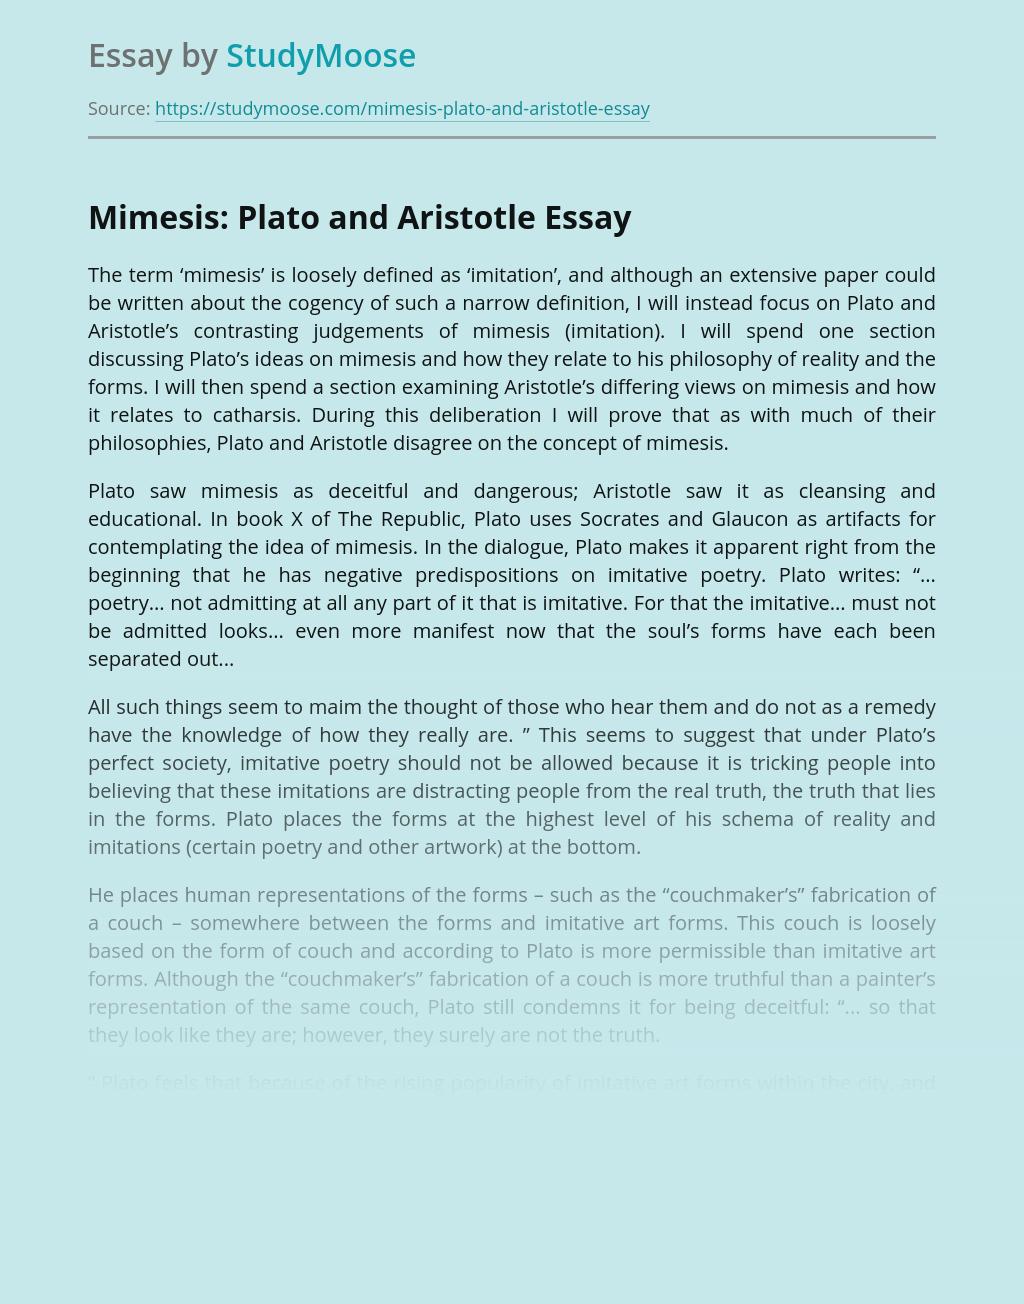 Mimesis: Plato and Aristotle